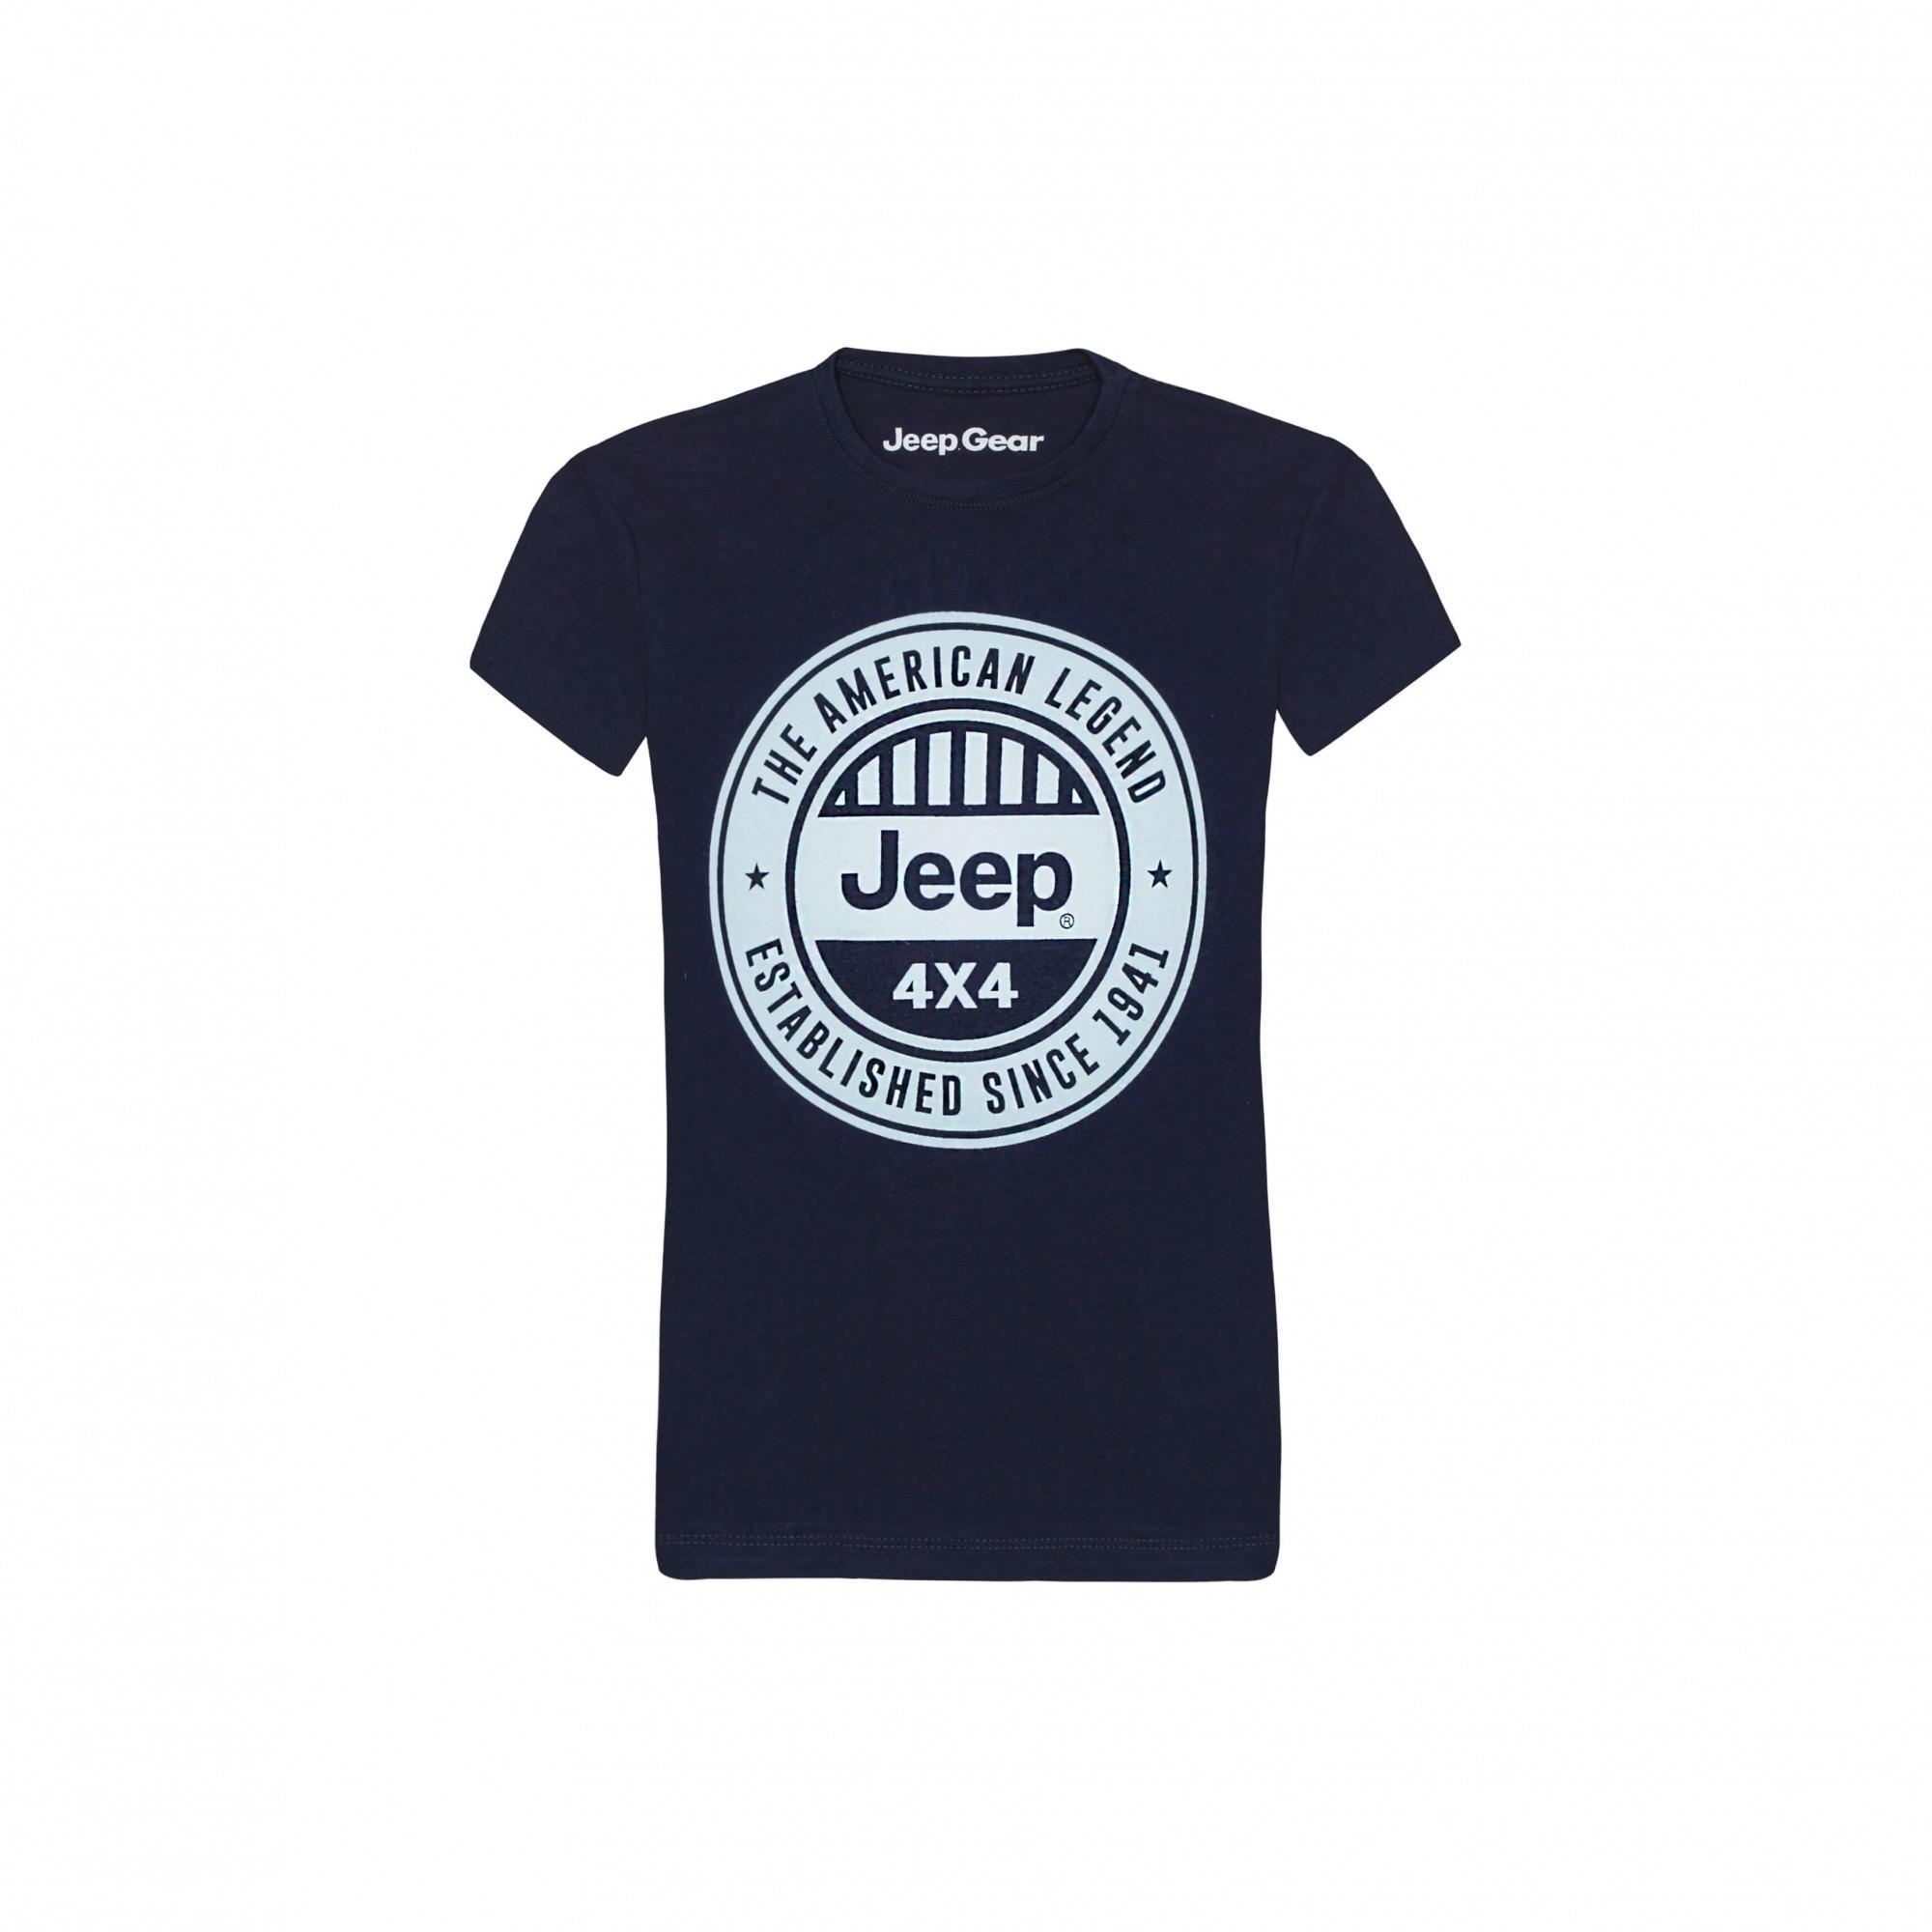 Camiseta Inf. Jeep American Legend 4x4 - Marinho